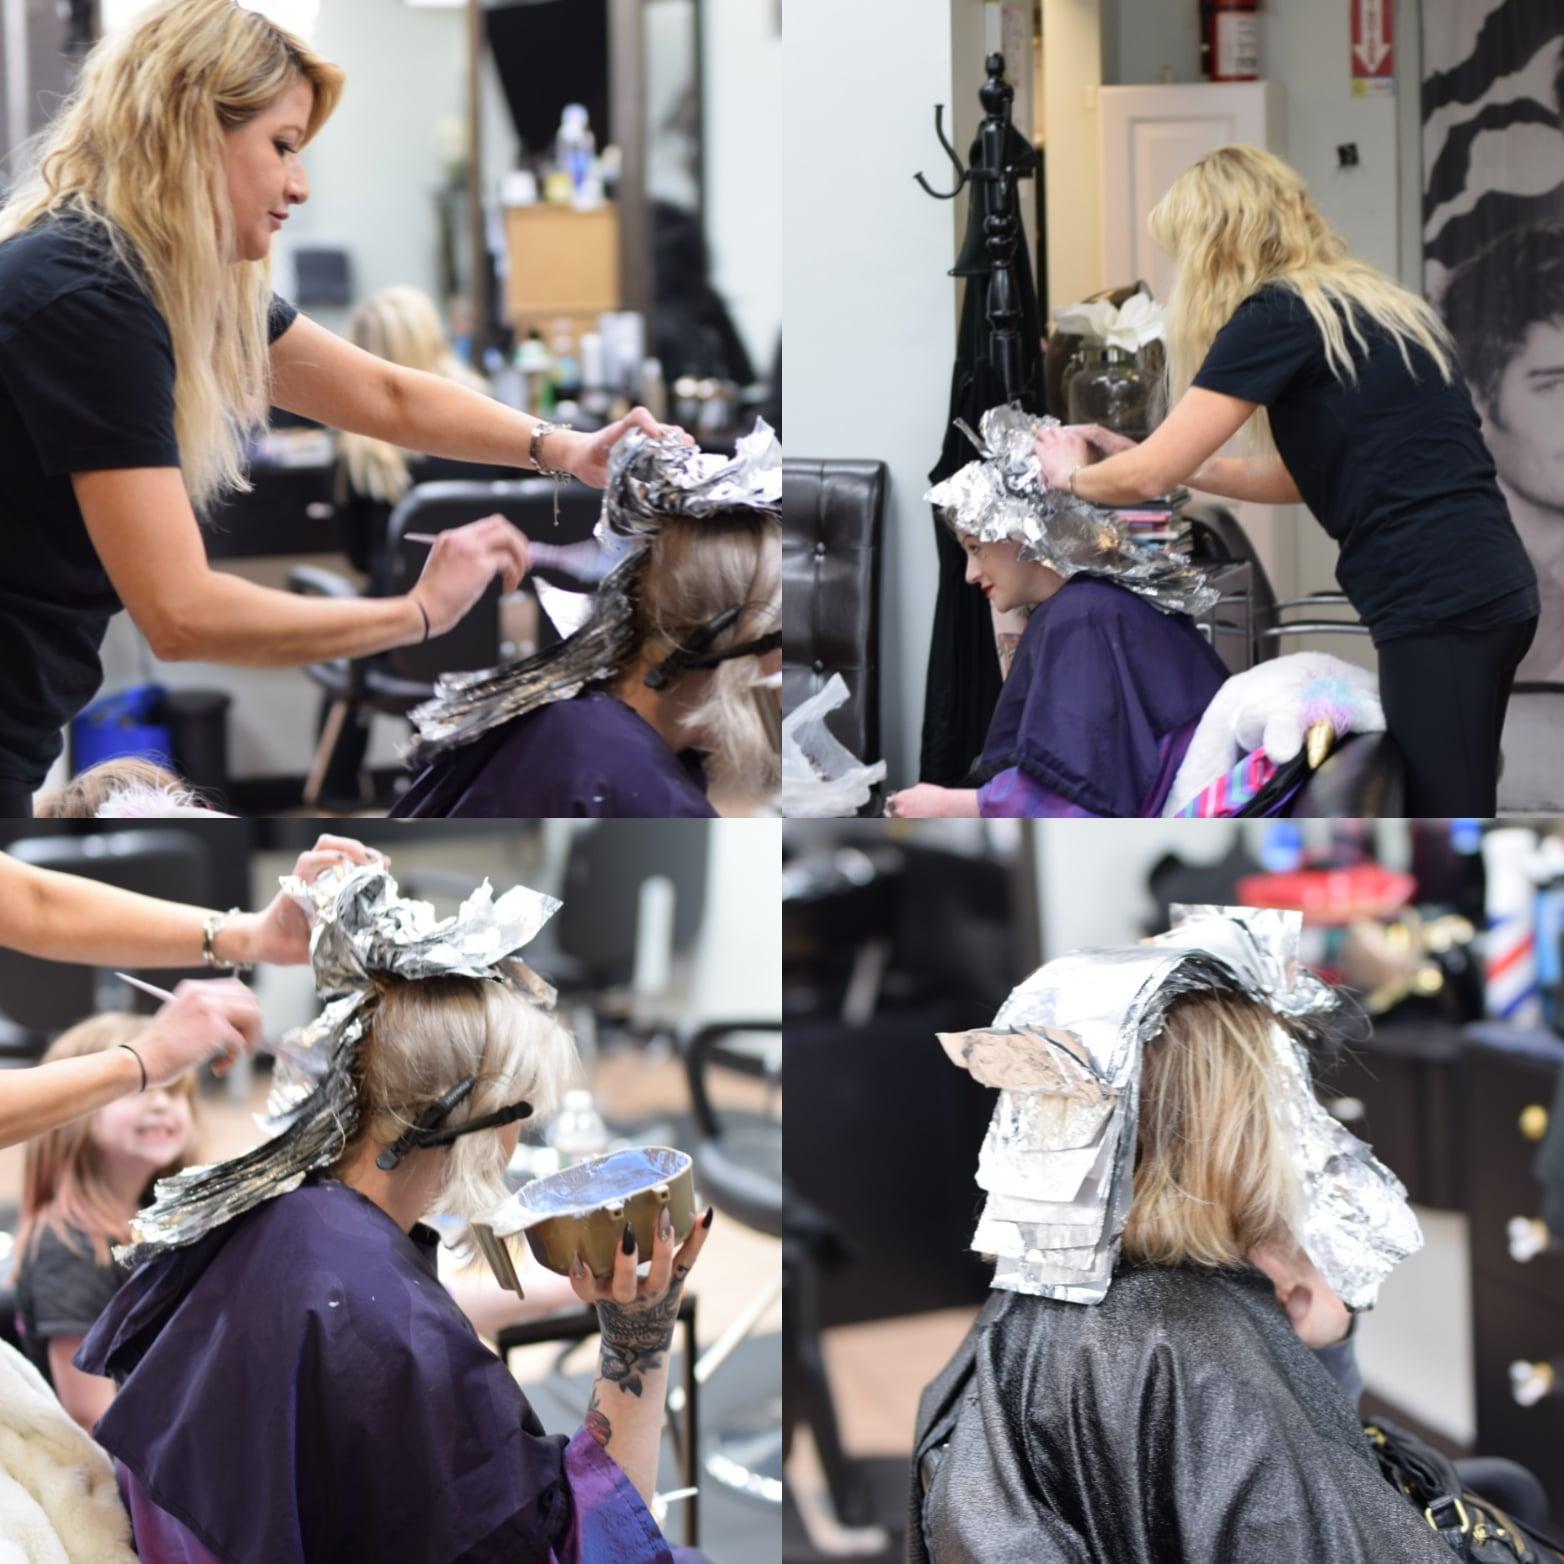 Phily's Cuts, Brick NJ, Hair color, bleach, going blonder, Beauty salon, foils, blonde specialist, Christina